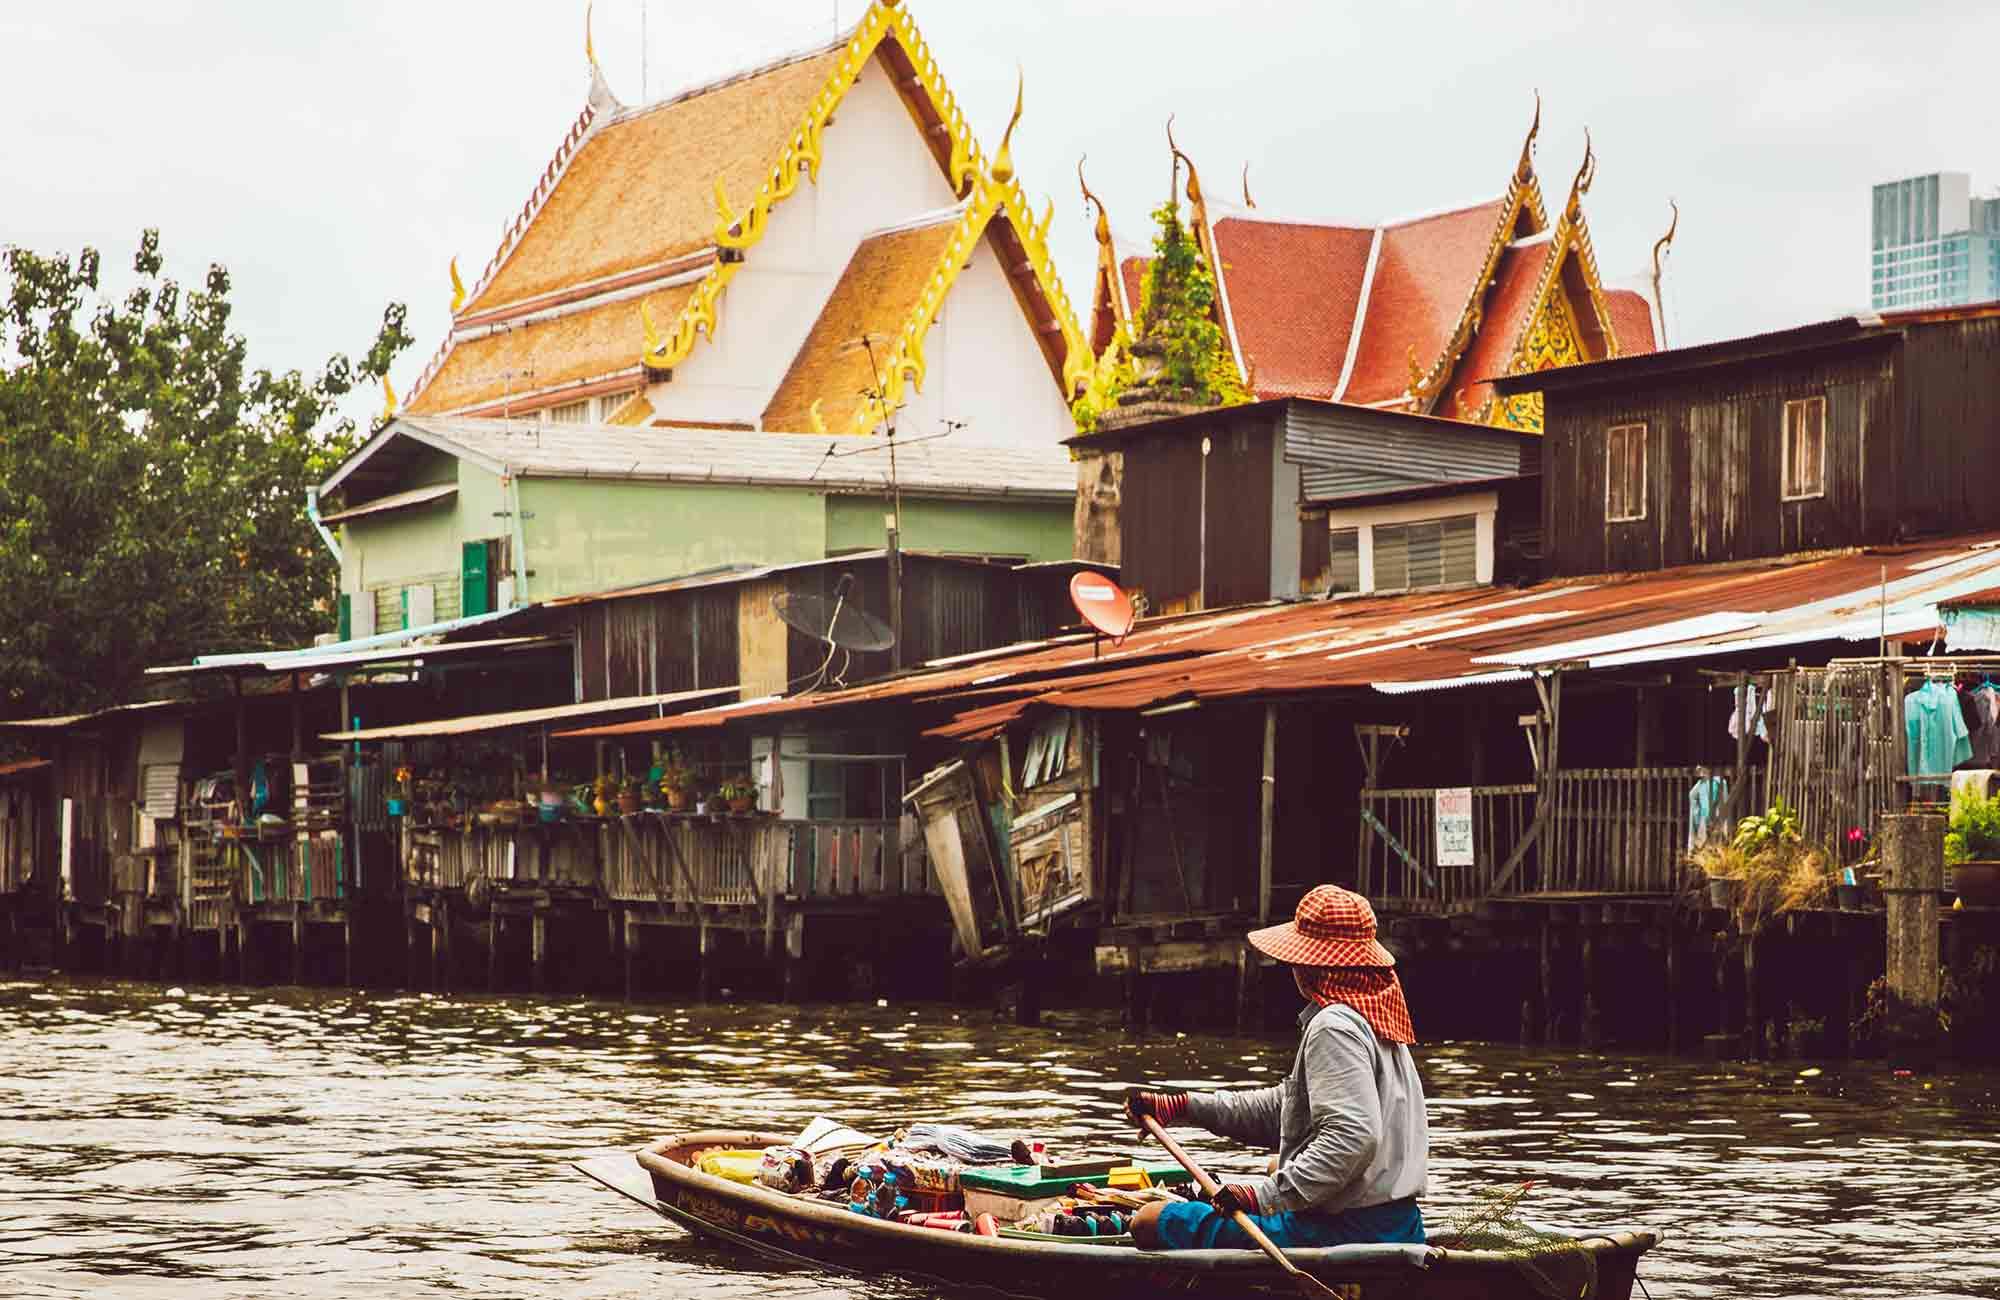 Voyage Thaïlande - Klongs Bangkok - Amplitudes